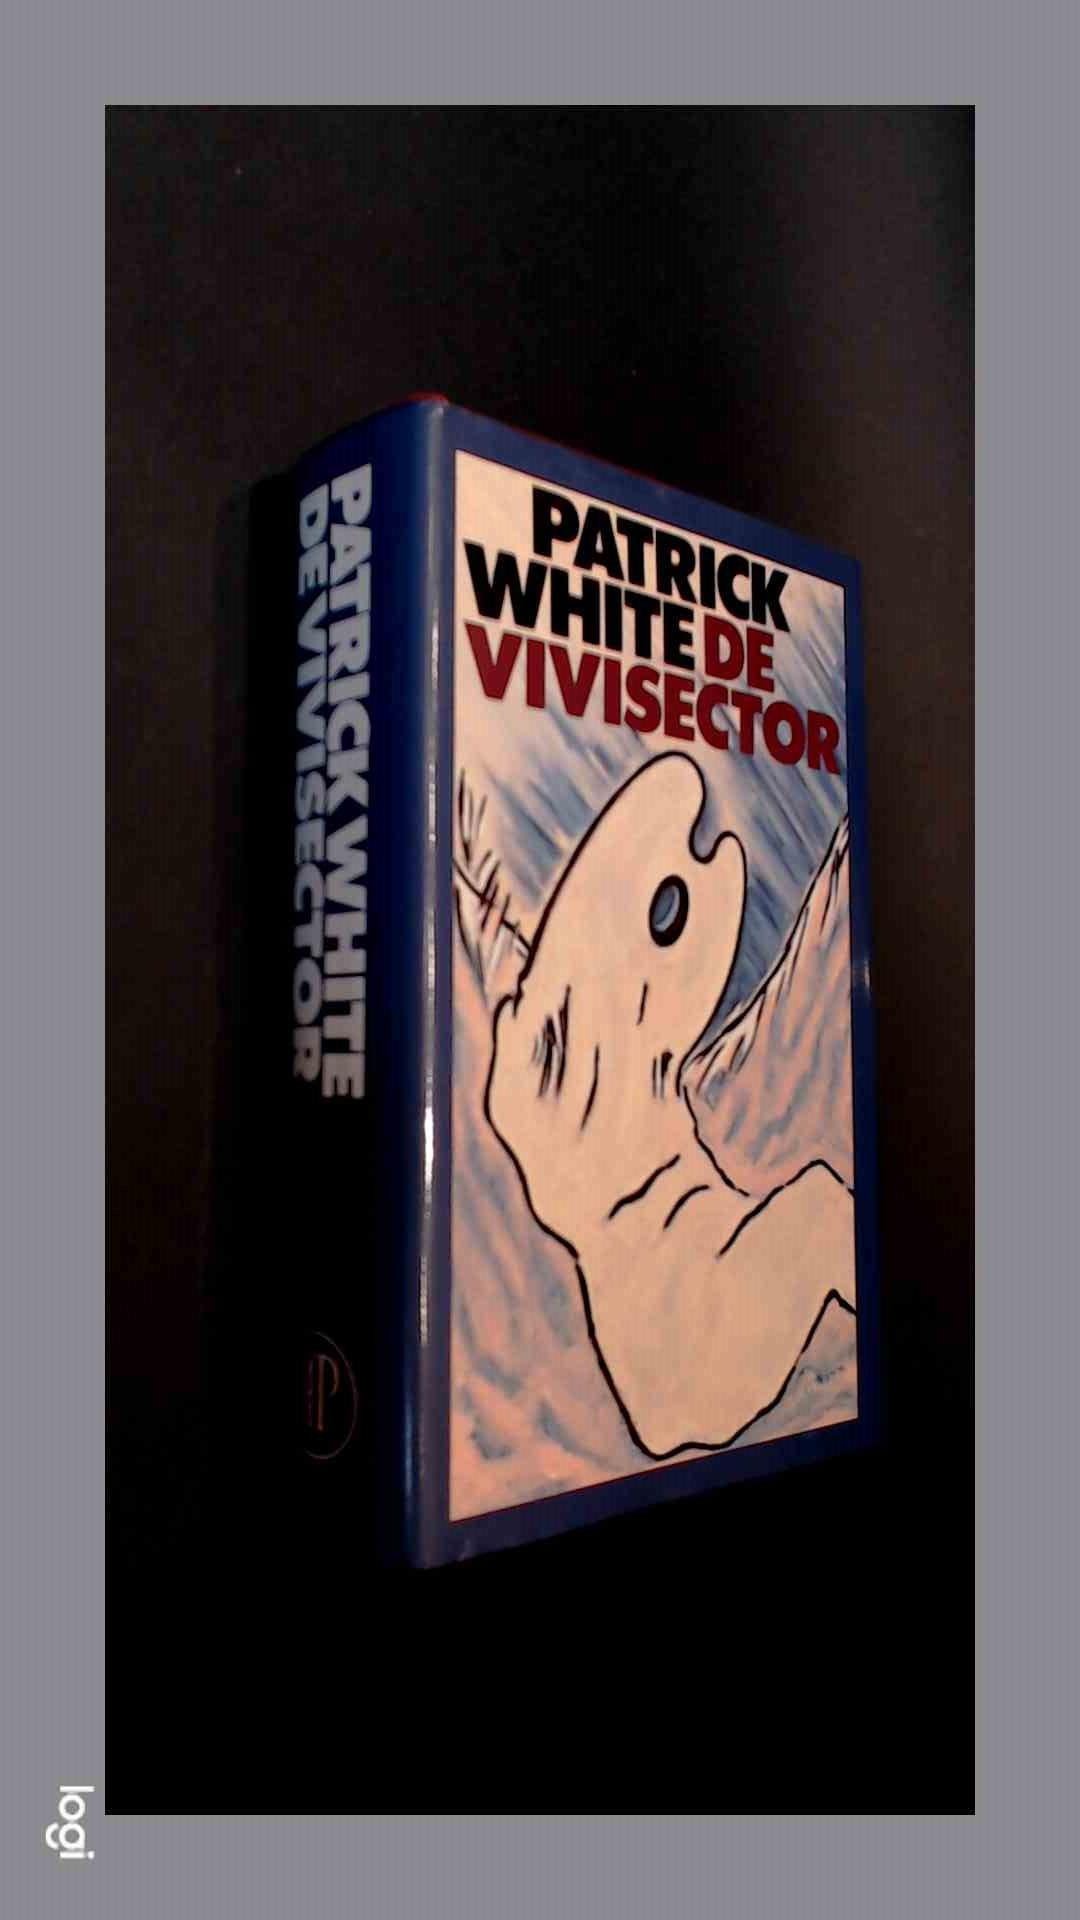 WHITE, PATRICK - De vivisector